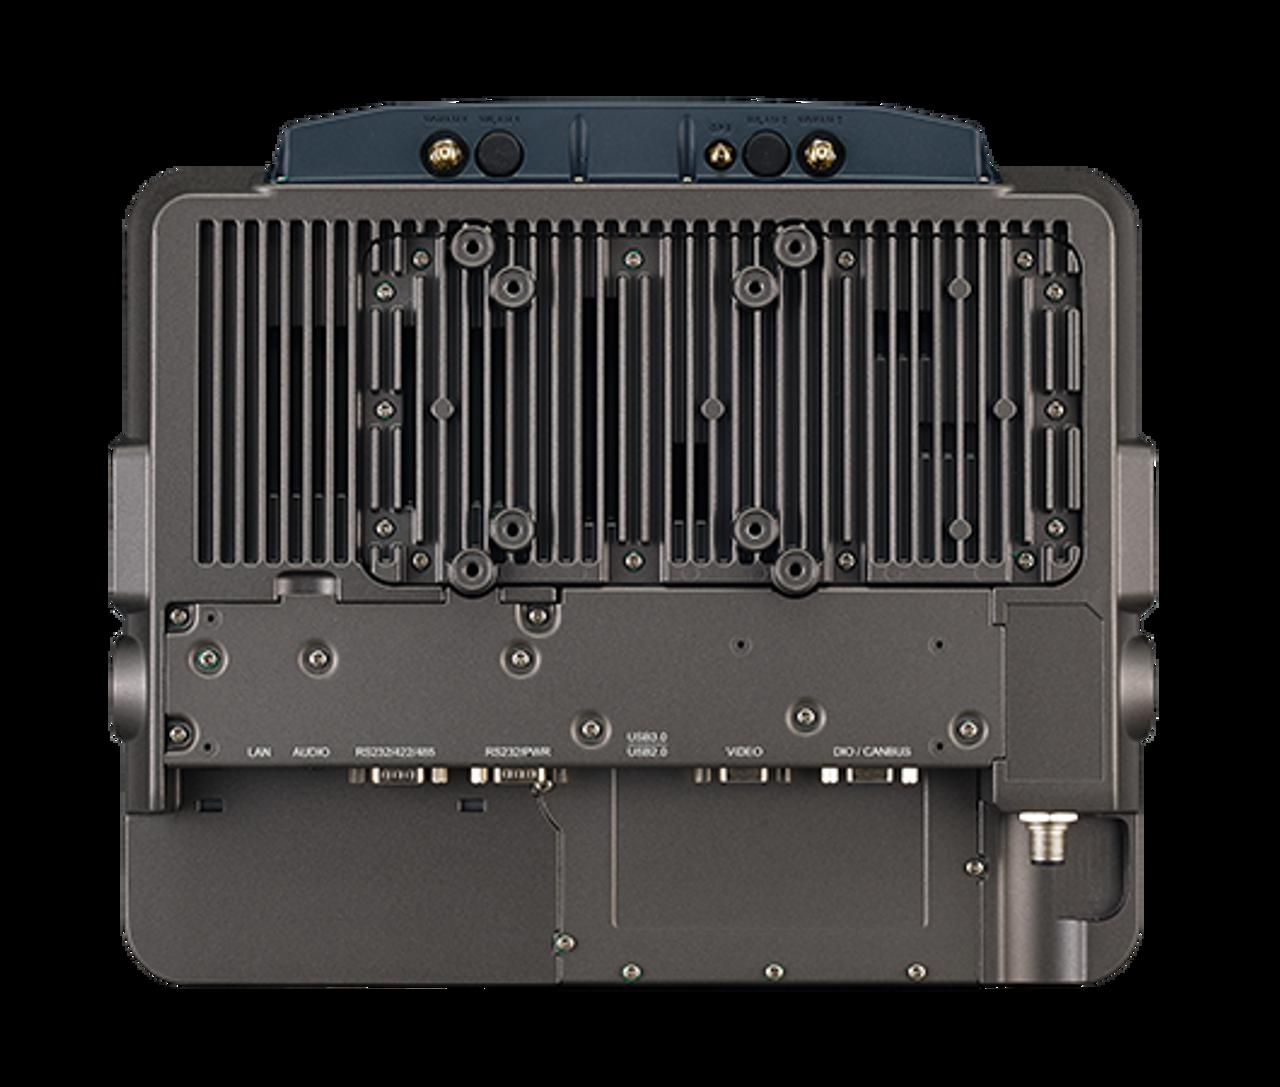 "RuggON VX-601 12.1"" Vehicle Mount Computer, rear"